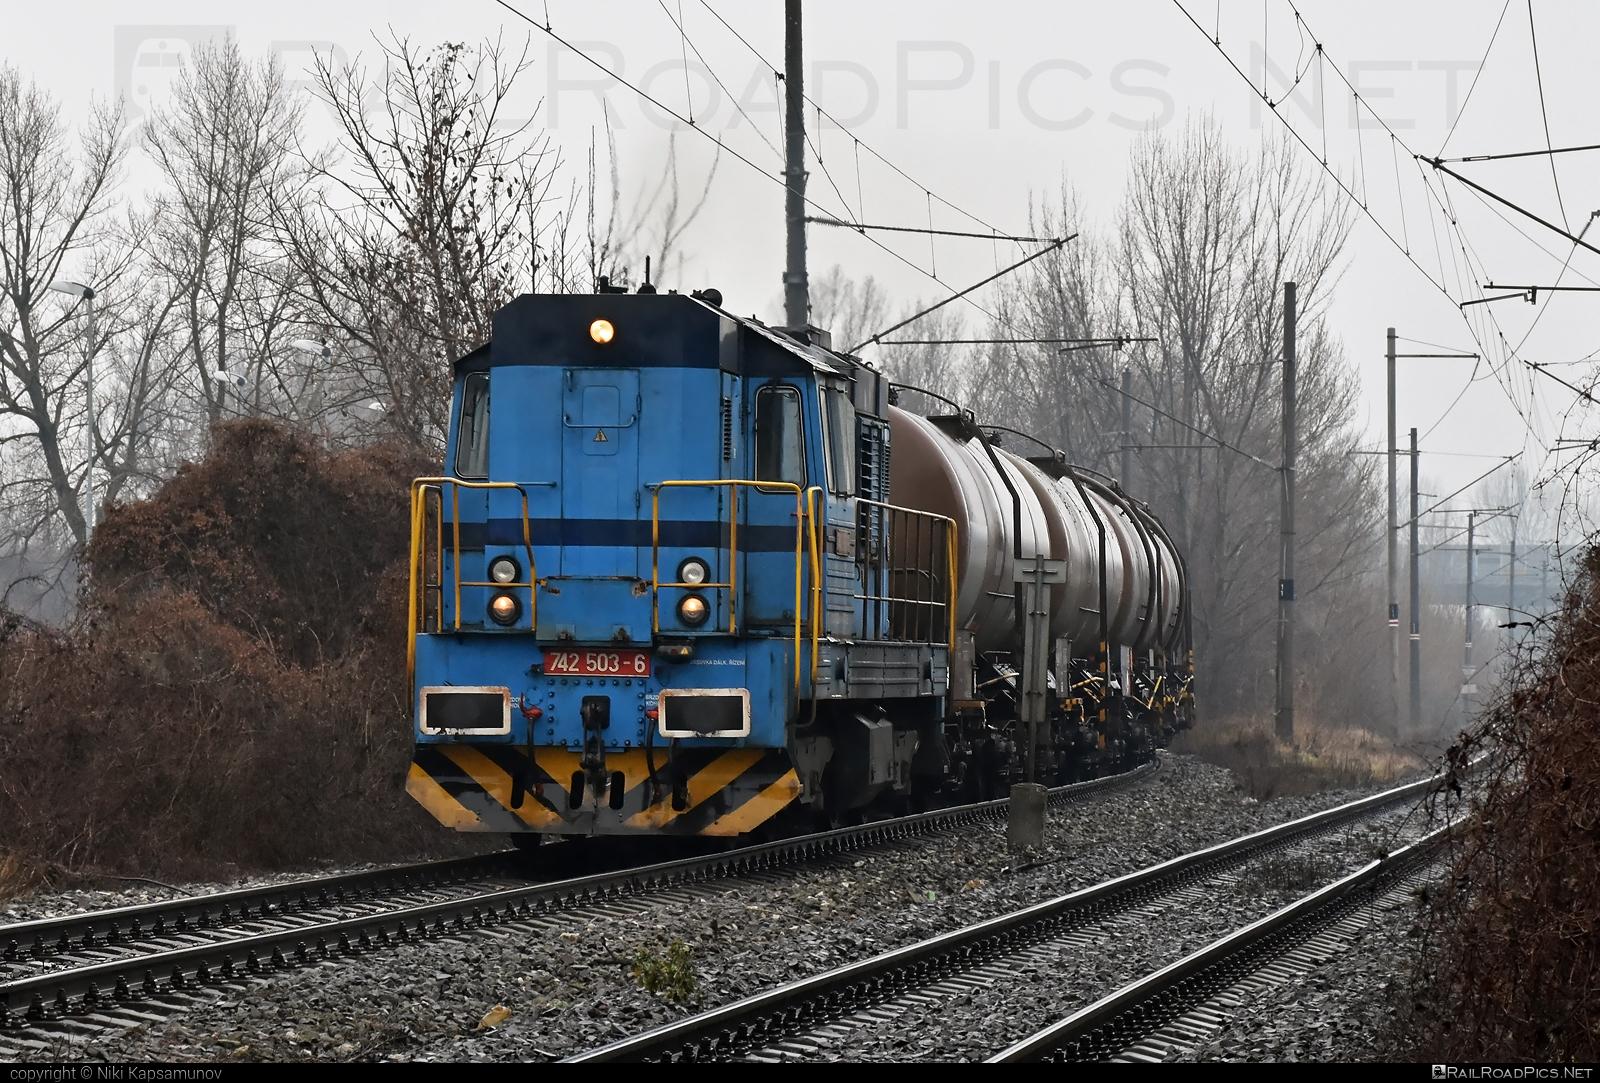 ČKD T 466.2 (742) - 742 503-6 operated by LOKORAIL, a.s. #OstravskaDopravniSpolecnostCargo #ckd #ckd4662 #ckd742 #ckdt4662 #kesselwagen #lokorail #lrl #odc #tankwagon